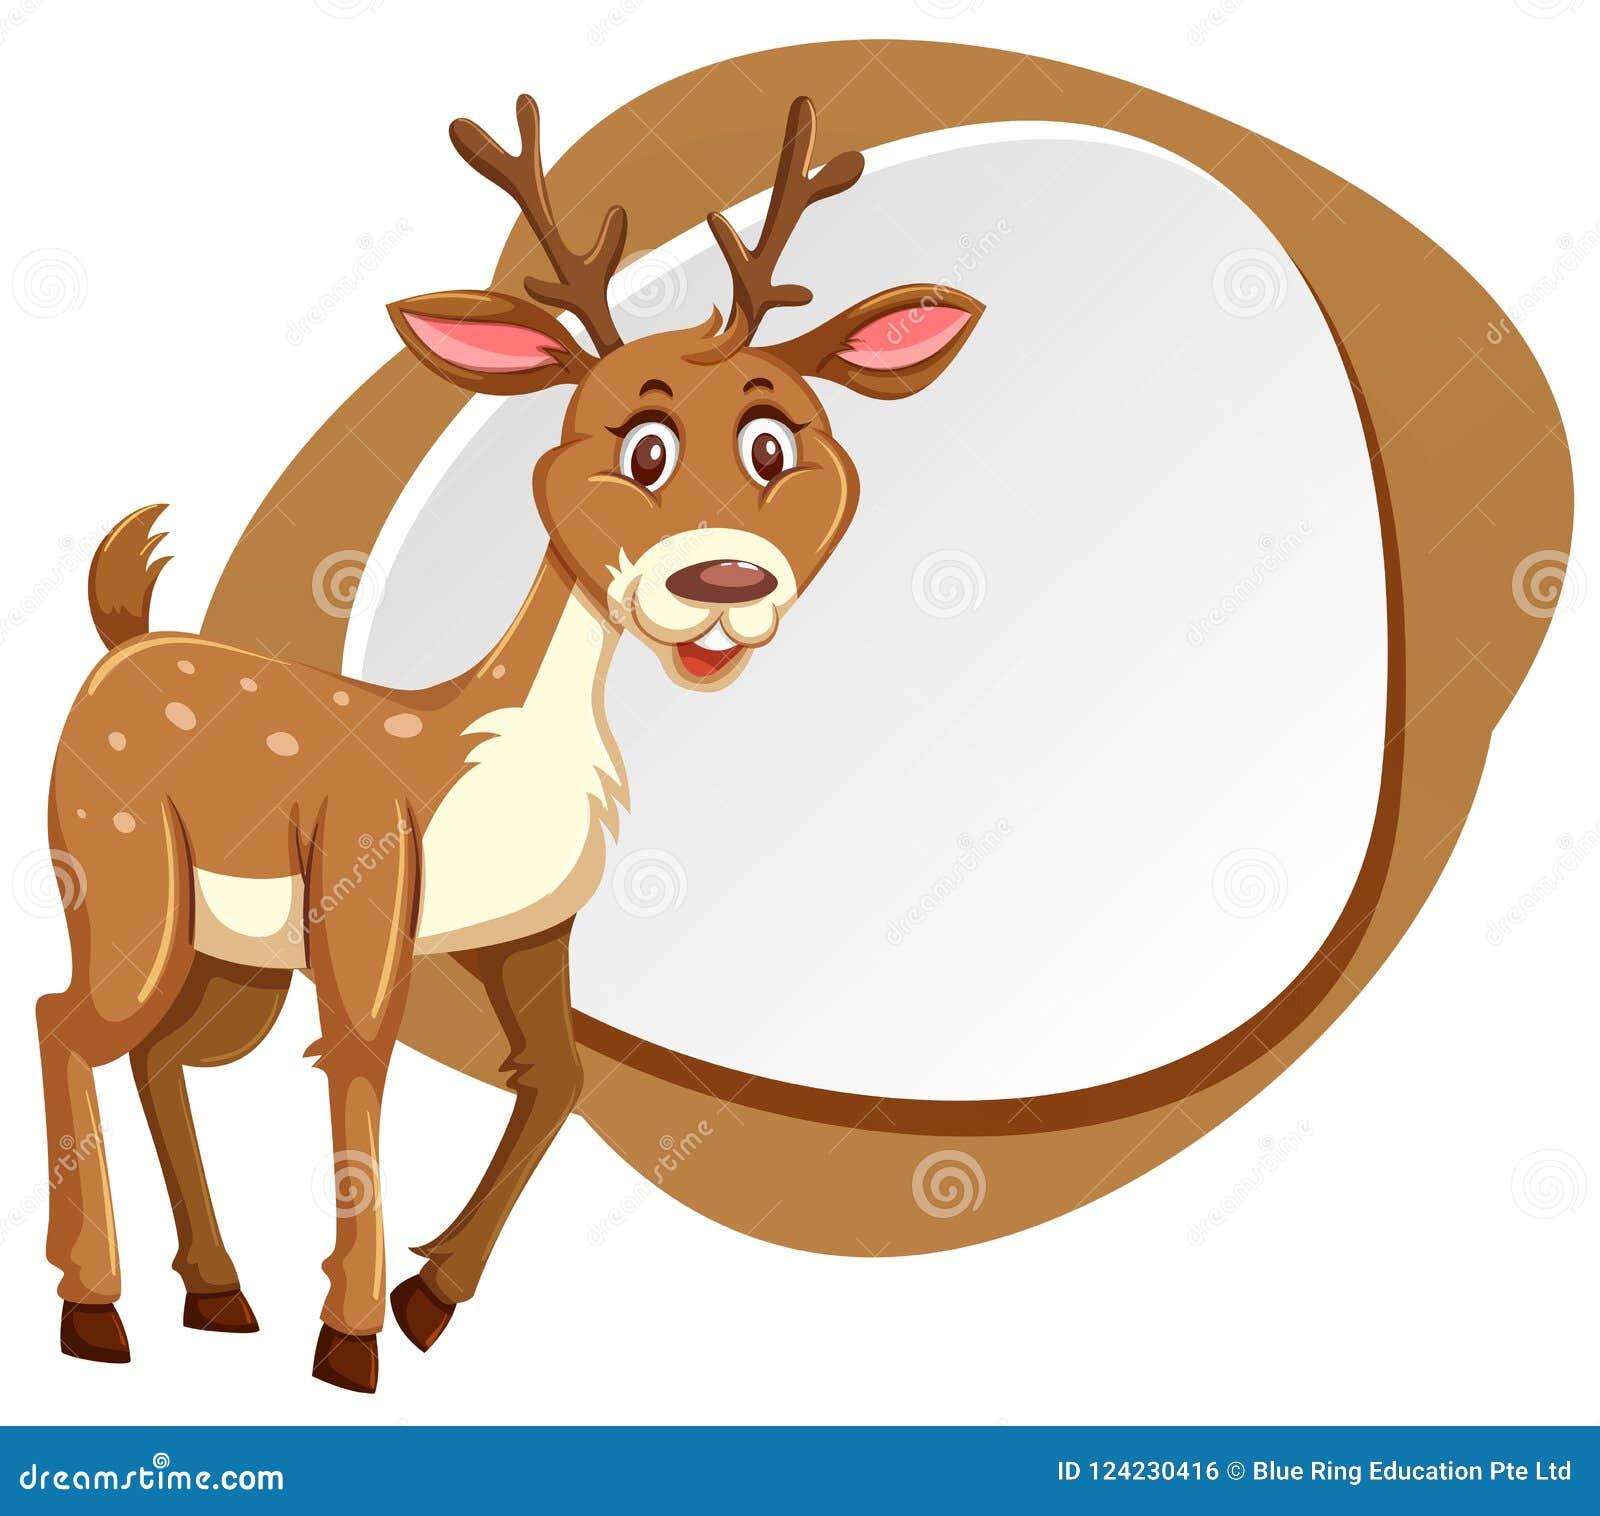 Cute Deer With Splash Frame Stock Vector - Illustration of colorful ...